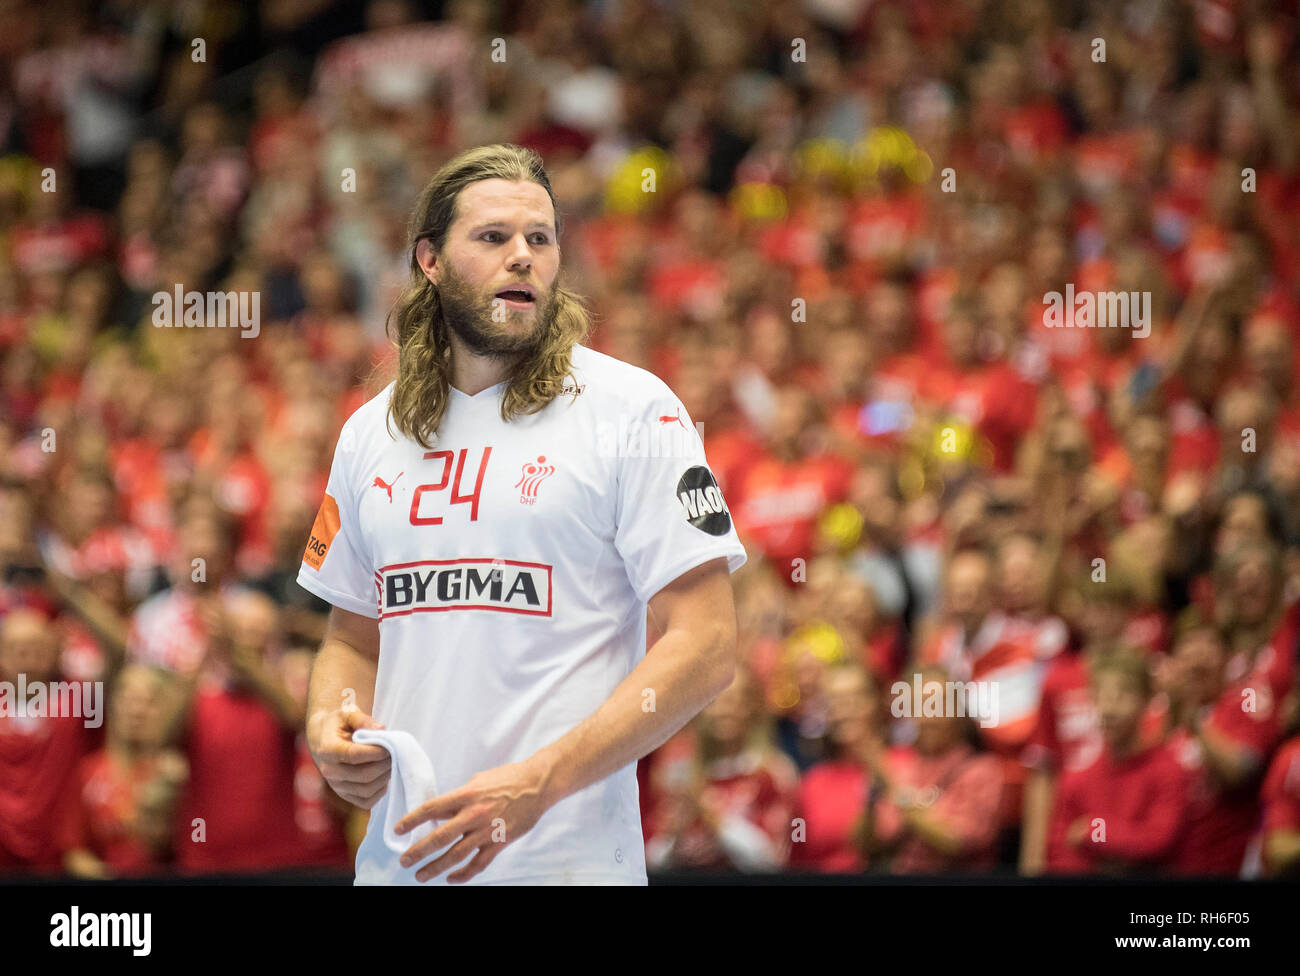 36d48d9c6 Mikkel HANSEN (DEN) Final, Norway (NOR) - Denmark (DEN) 22:31, 27.01 ...